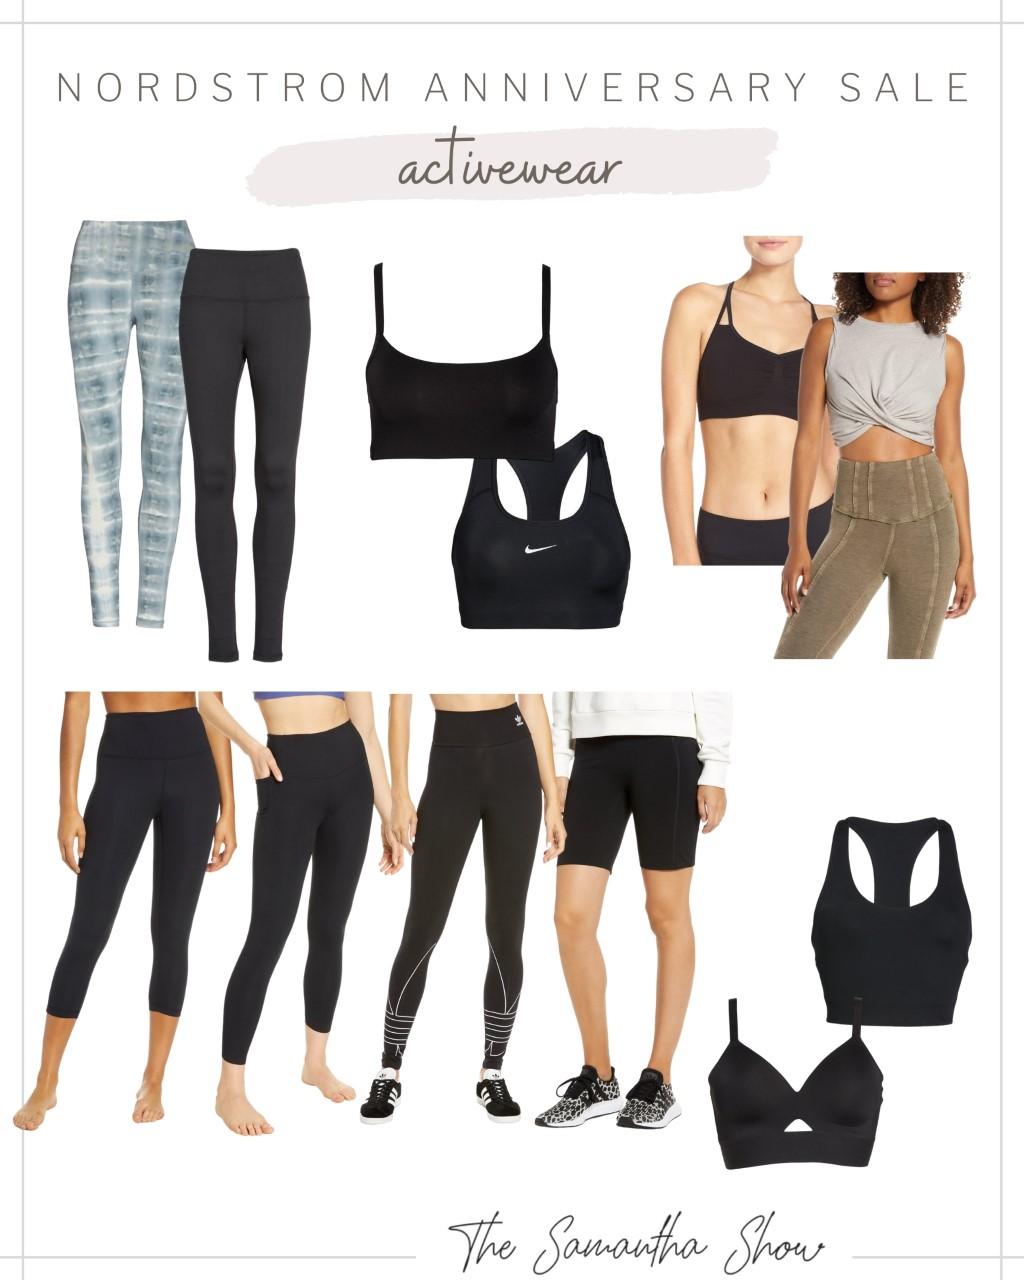 Nordstrom Anniversary Sale: Activewear